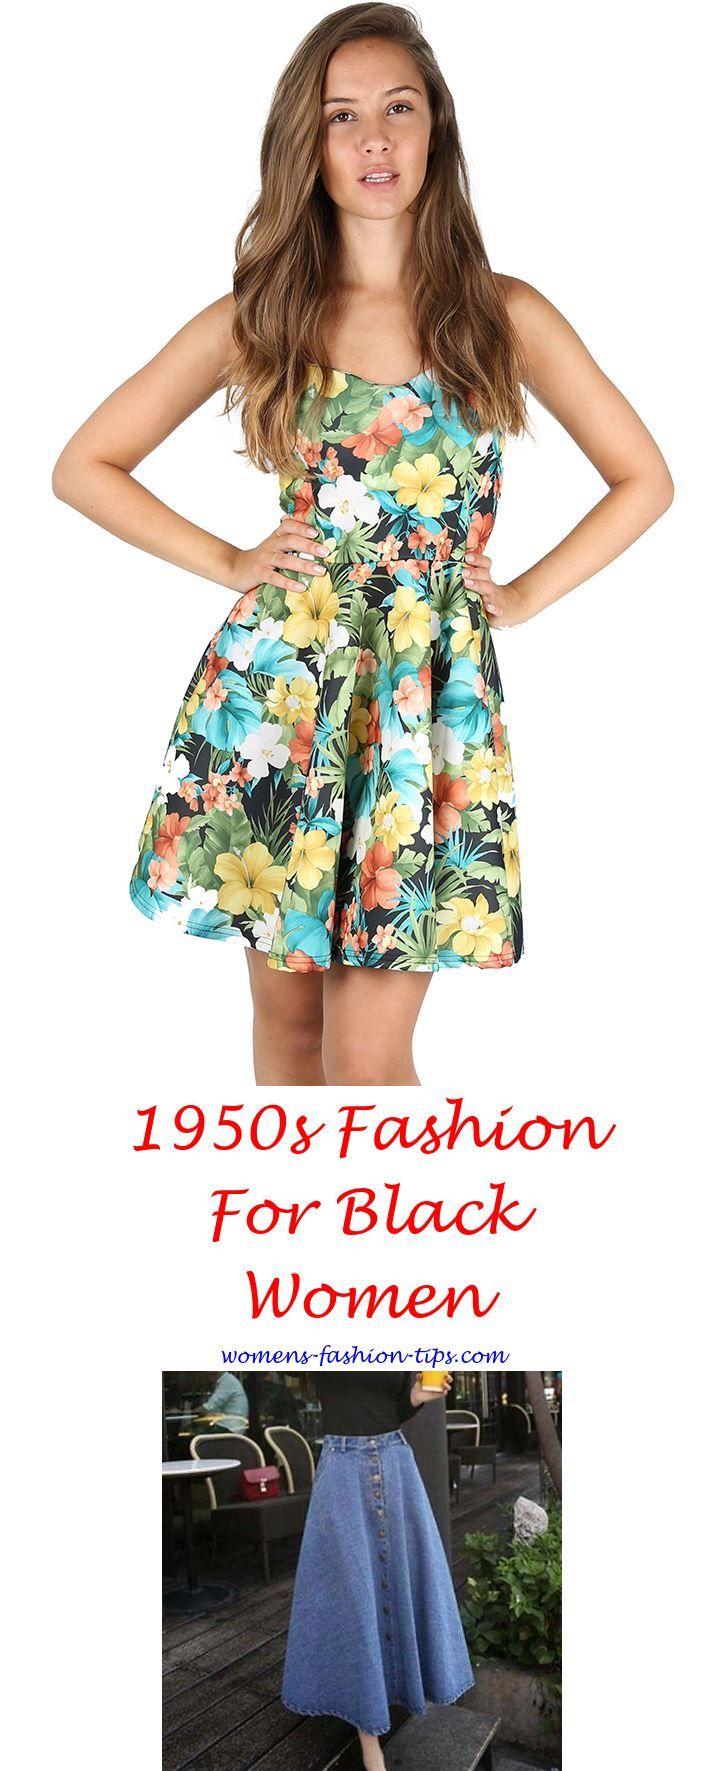 1980's women's fashion - women fashion sunglasses.1970s women fashion pictures 1930s fashion women hats outfit ideas women over 50 6881716819